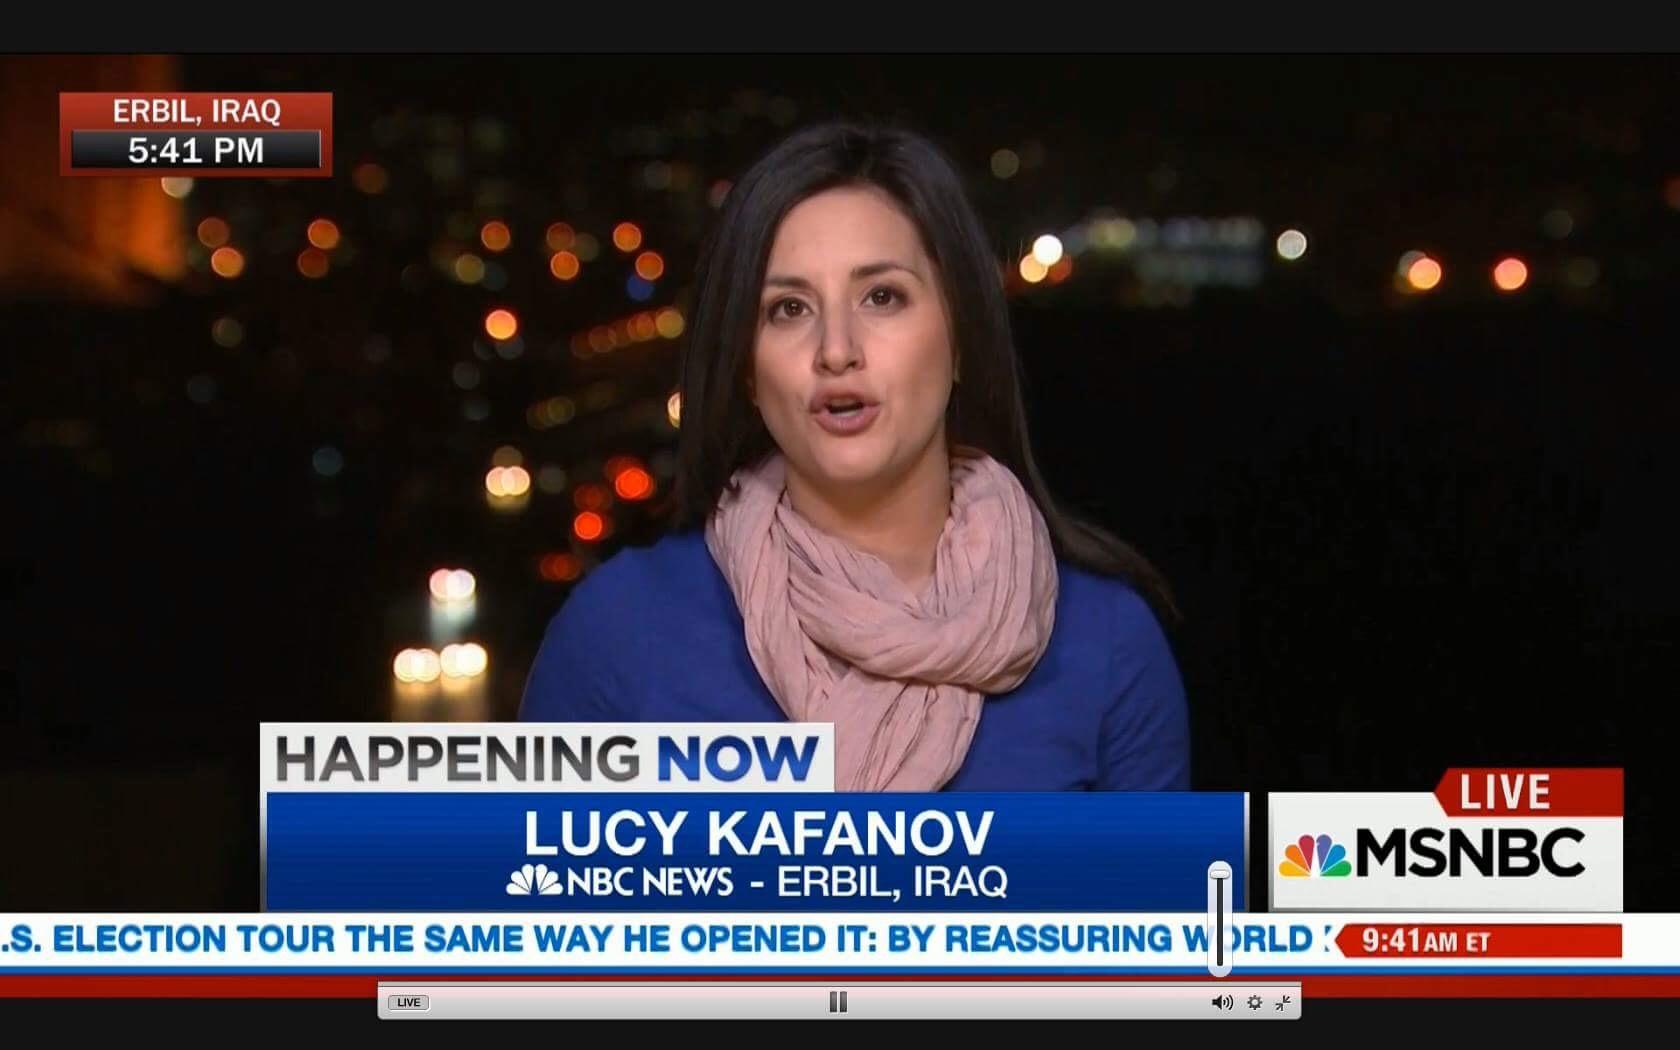 LUCY KAFANOV - NBC NEWS FOREIGN CORRESPONDENT